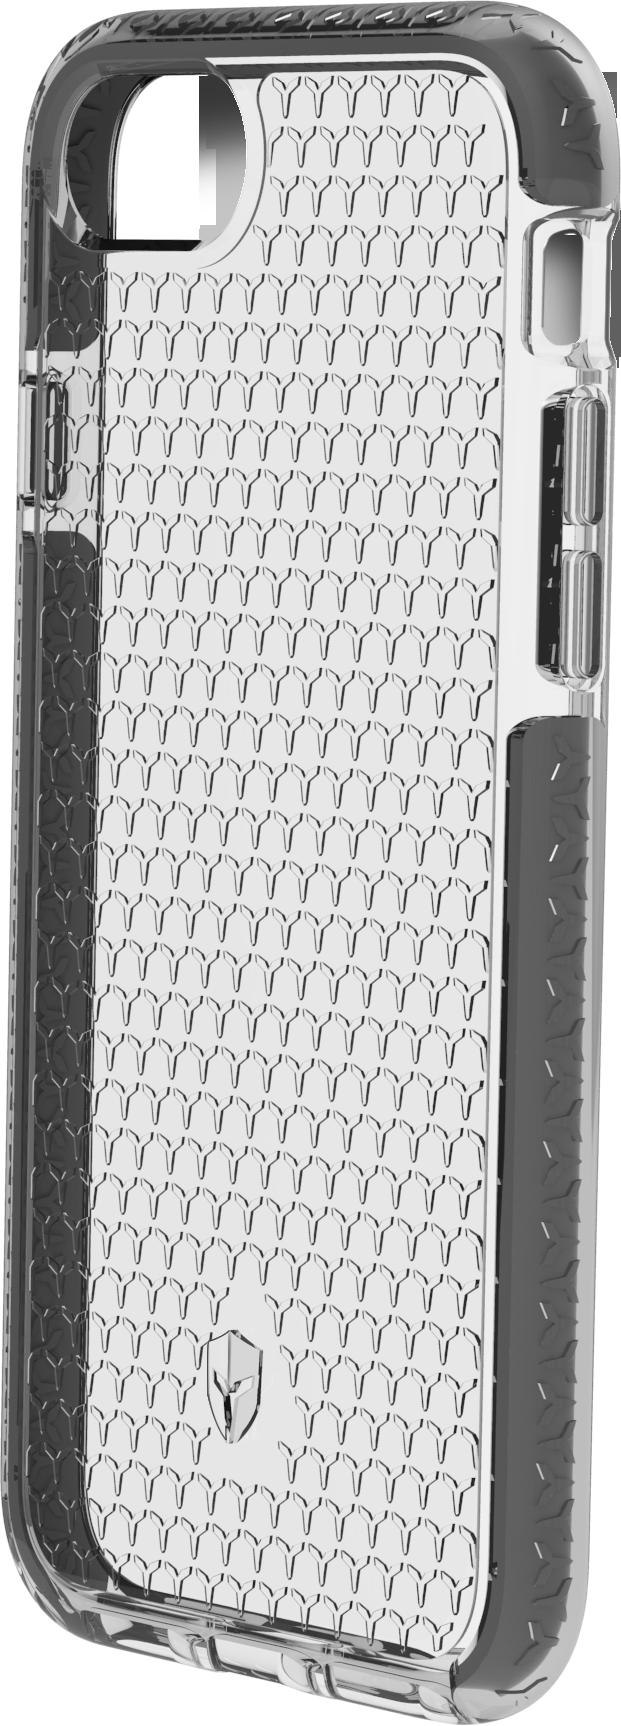 Coque renforcée Force Case Life iPhone 6s / 7 / 8